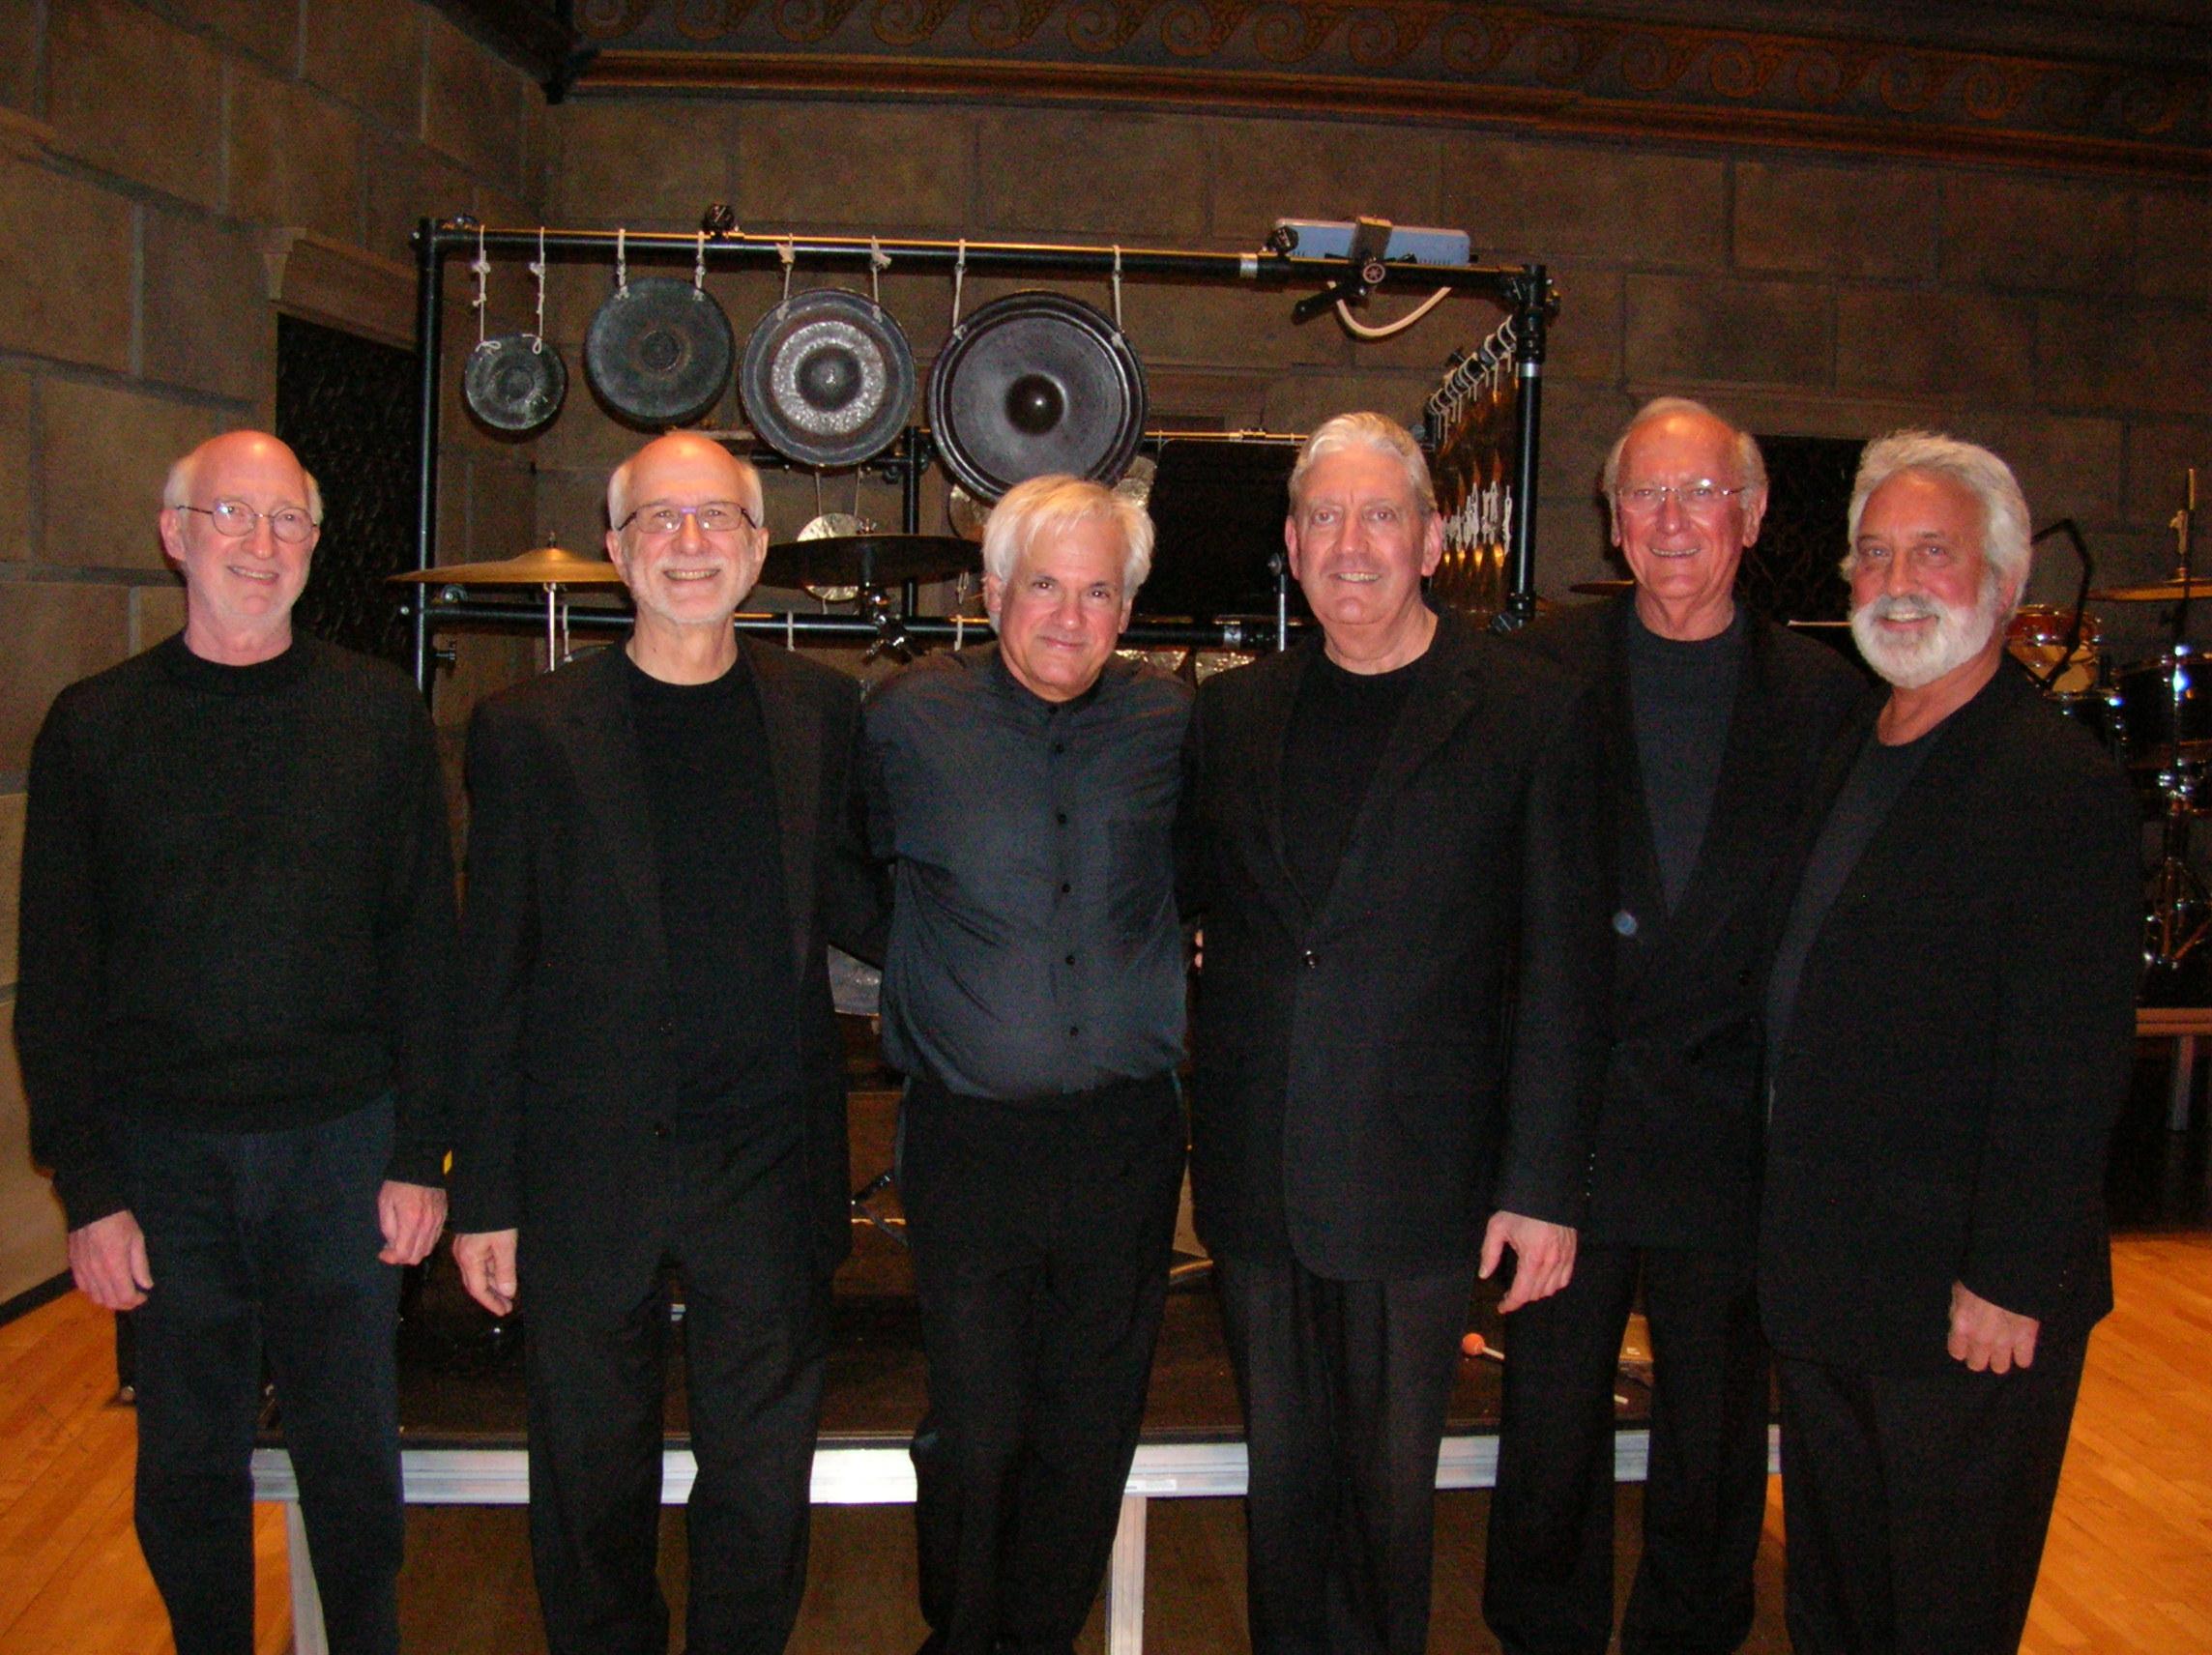 (L to R) Bob, Russell, Neil Varon, Bill, John Beck, Garry